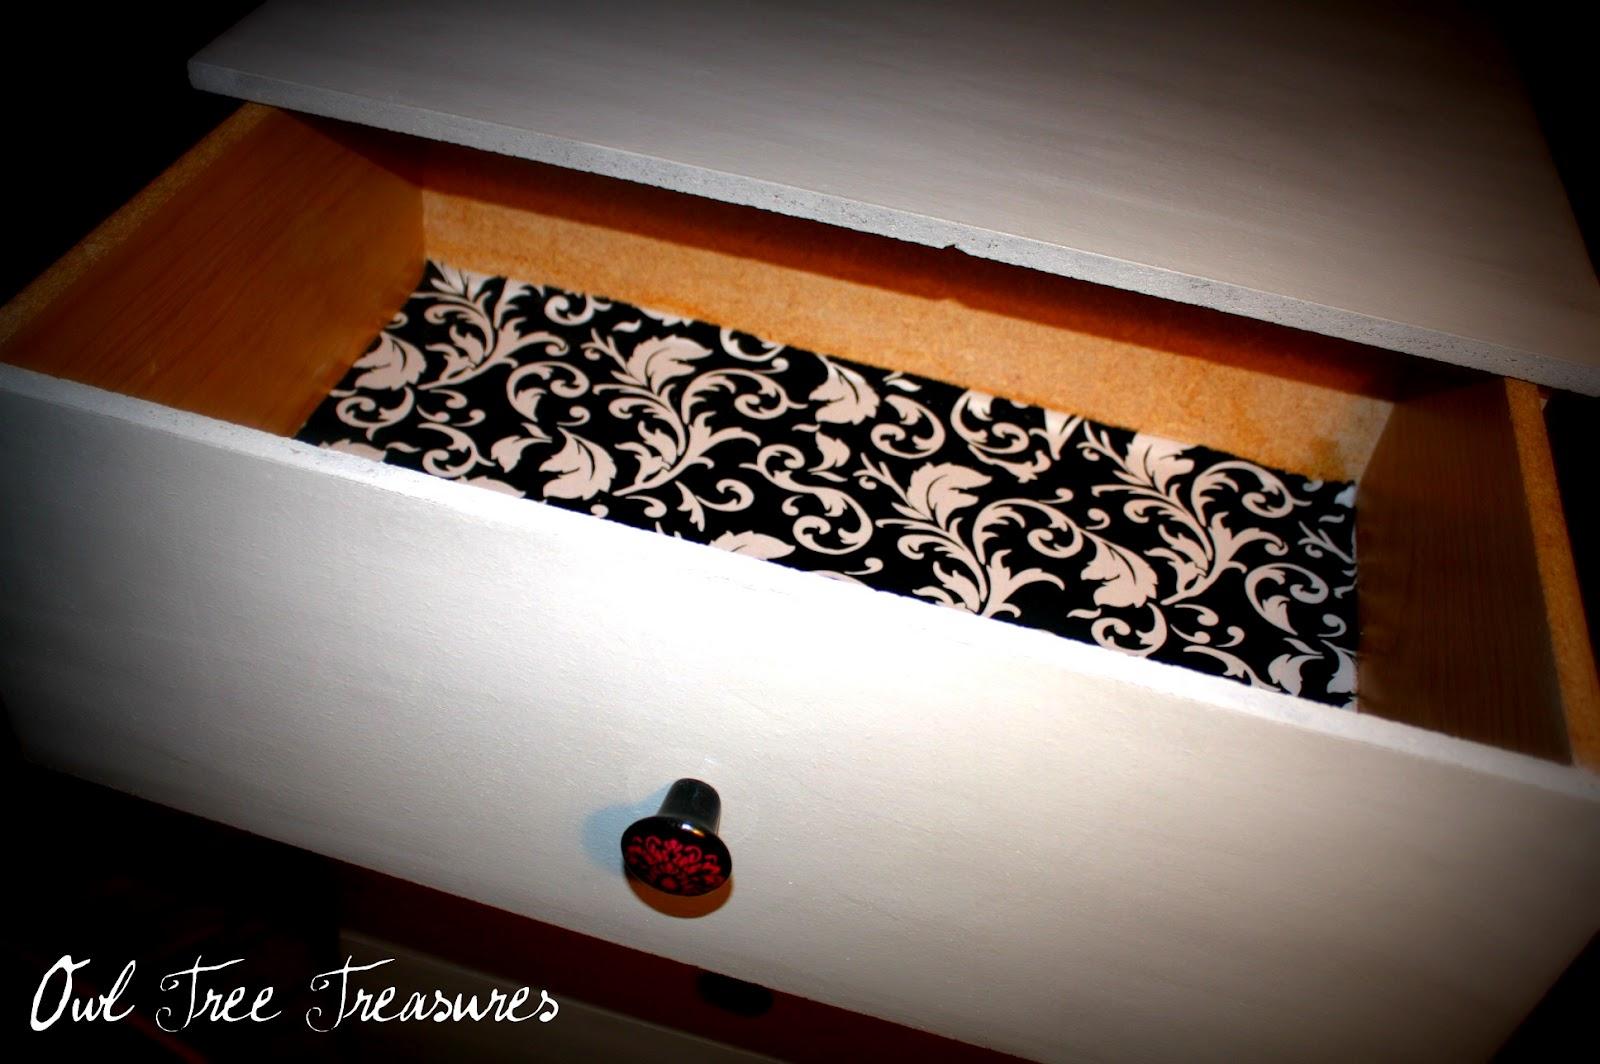 Owl Tree Treasures: Small White Dresser